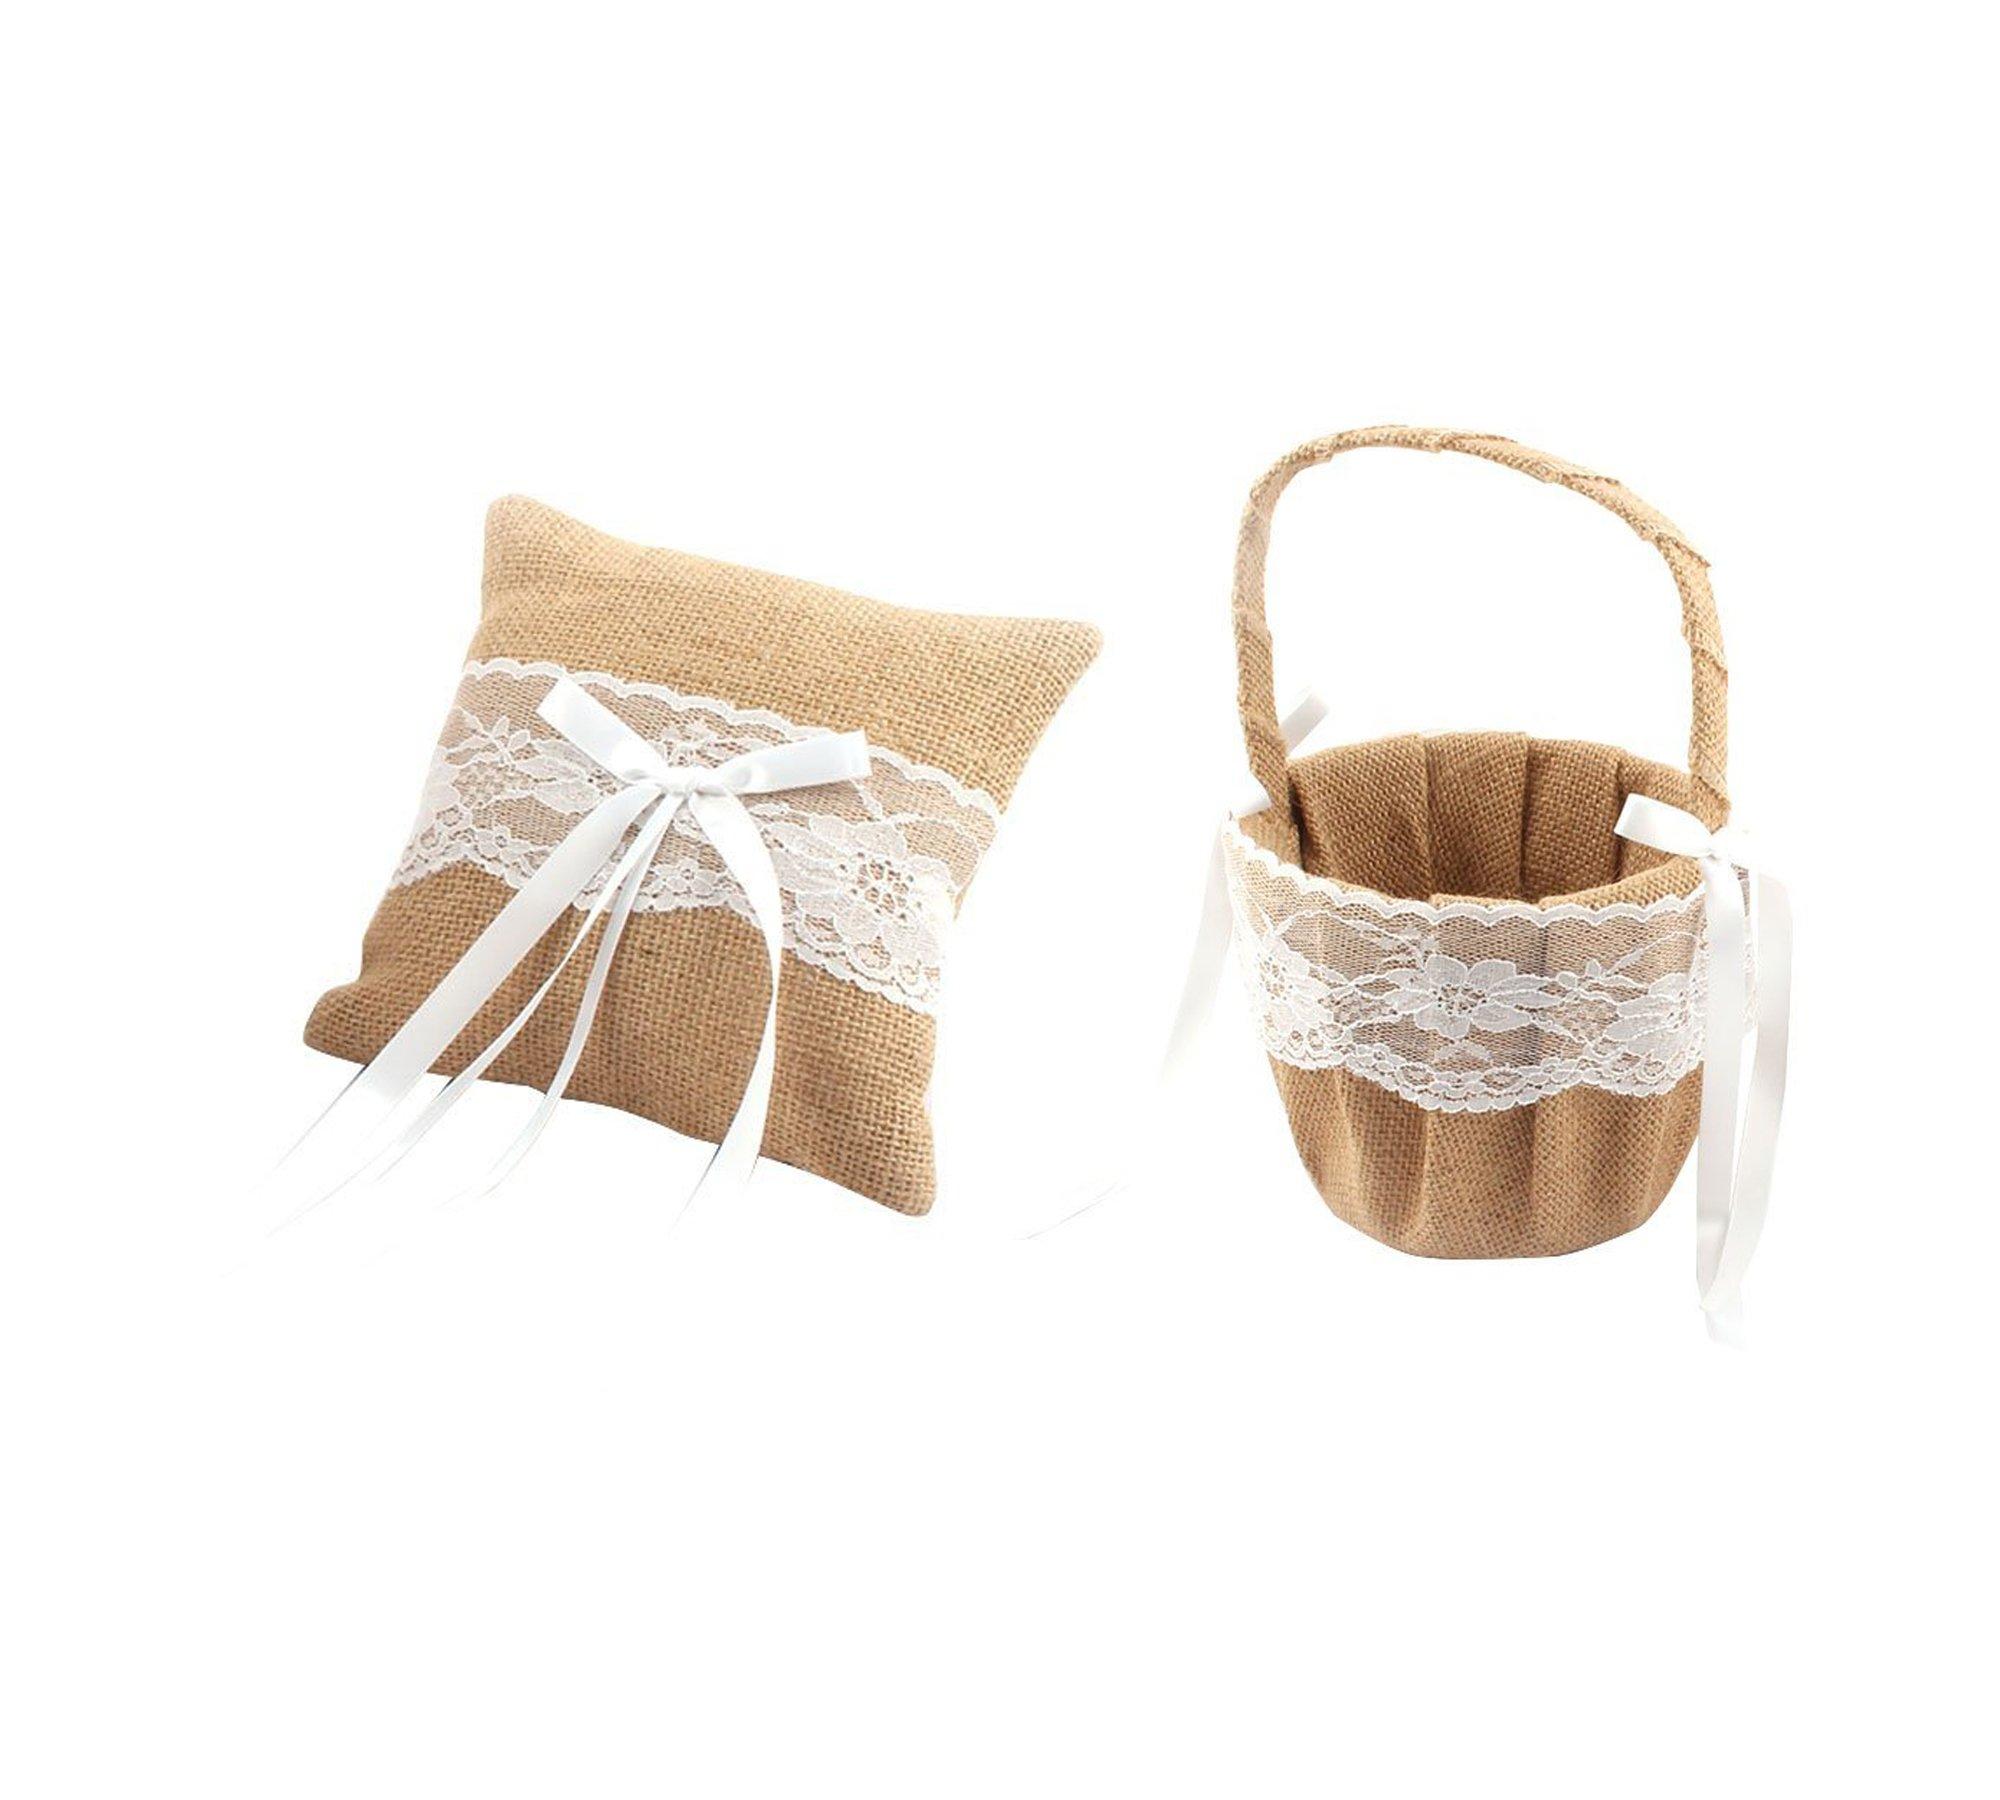 Antrader Romantic Burlap Lace Decor Petals Storage Flower Container Basket Ring Pillow Set for Wedding Anniversary Celebrations Party Decoration (Khaki B)